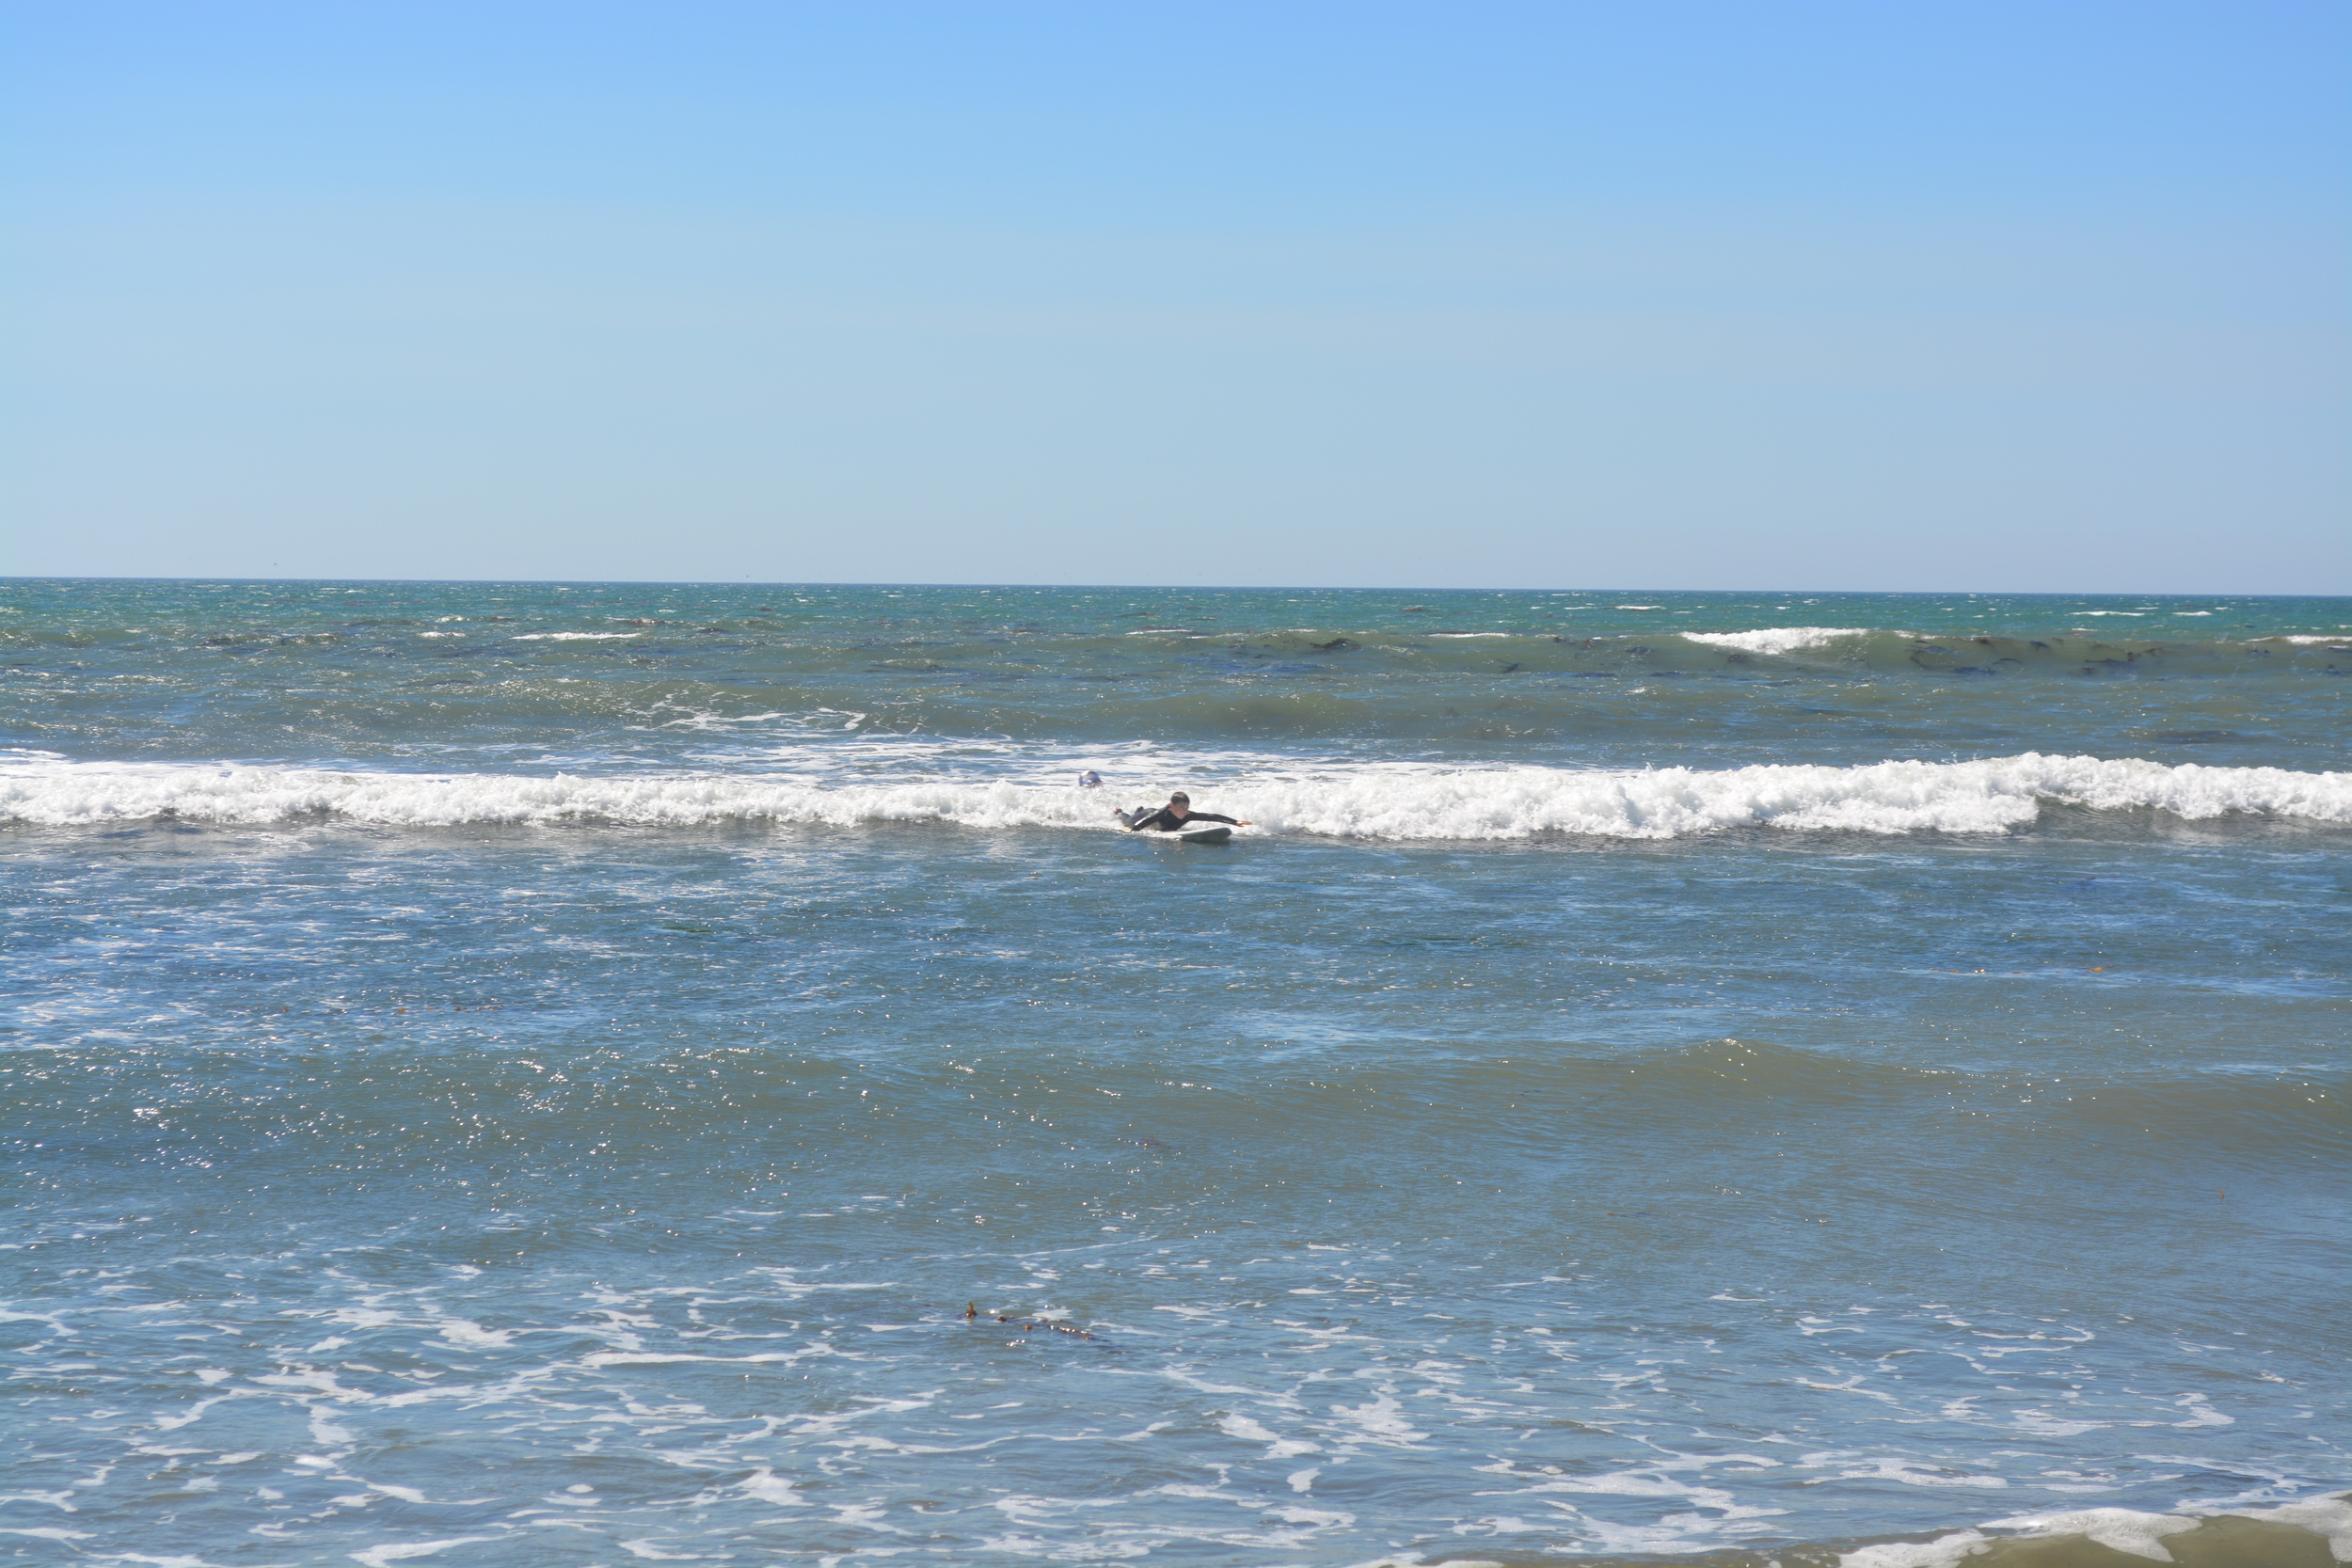 Baja California 10-5-13 Shipwrecks Surfing Adventure Ocean Experience Surf School San Diego (8).JPG